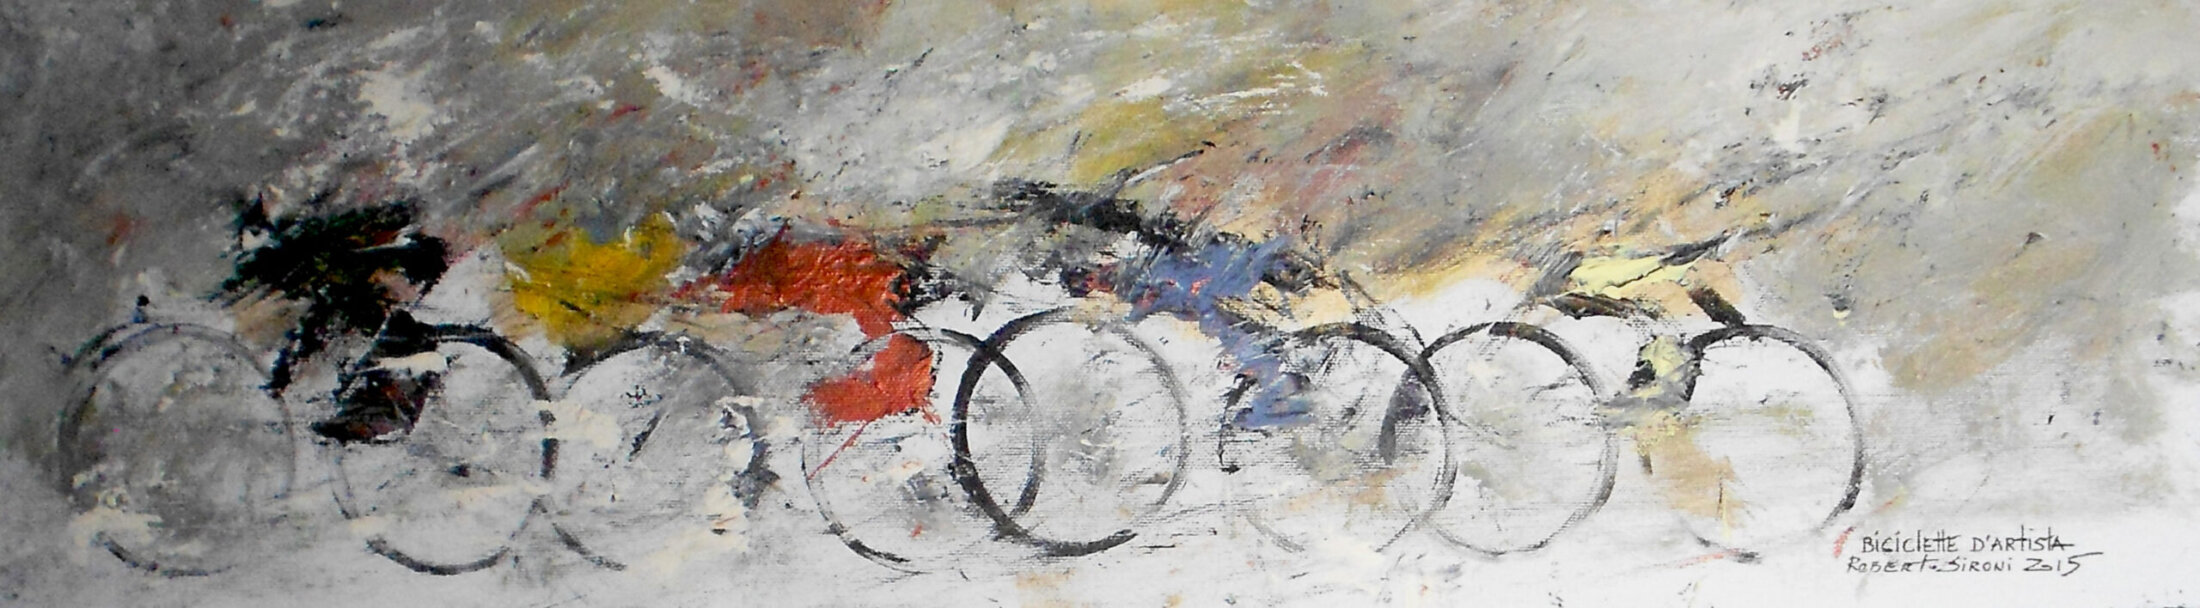 BiciclettaDArtista-R.Sironi-OlioSuTela-20x70